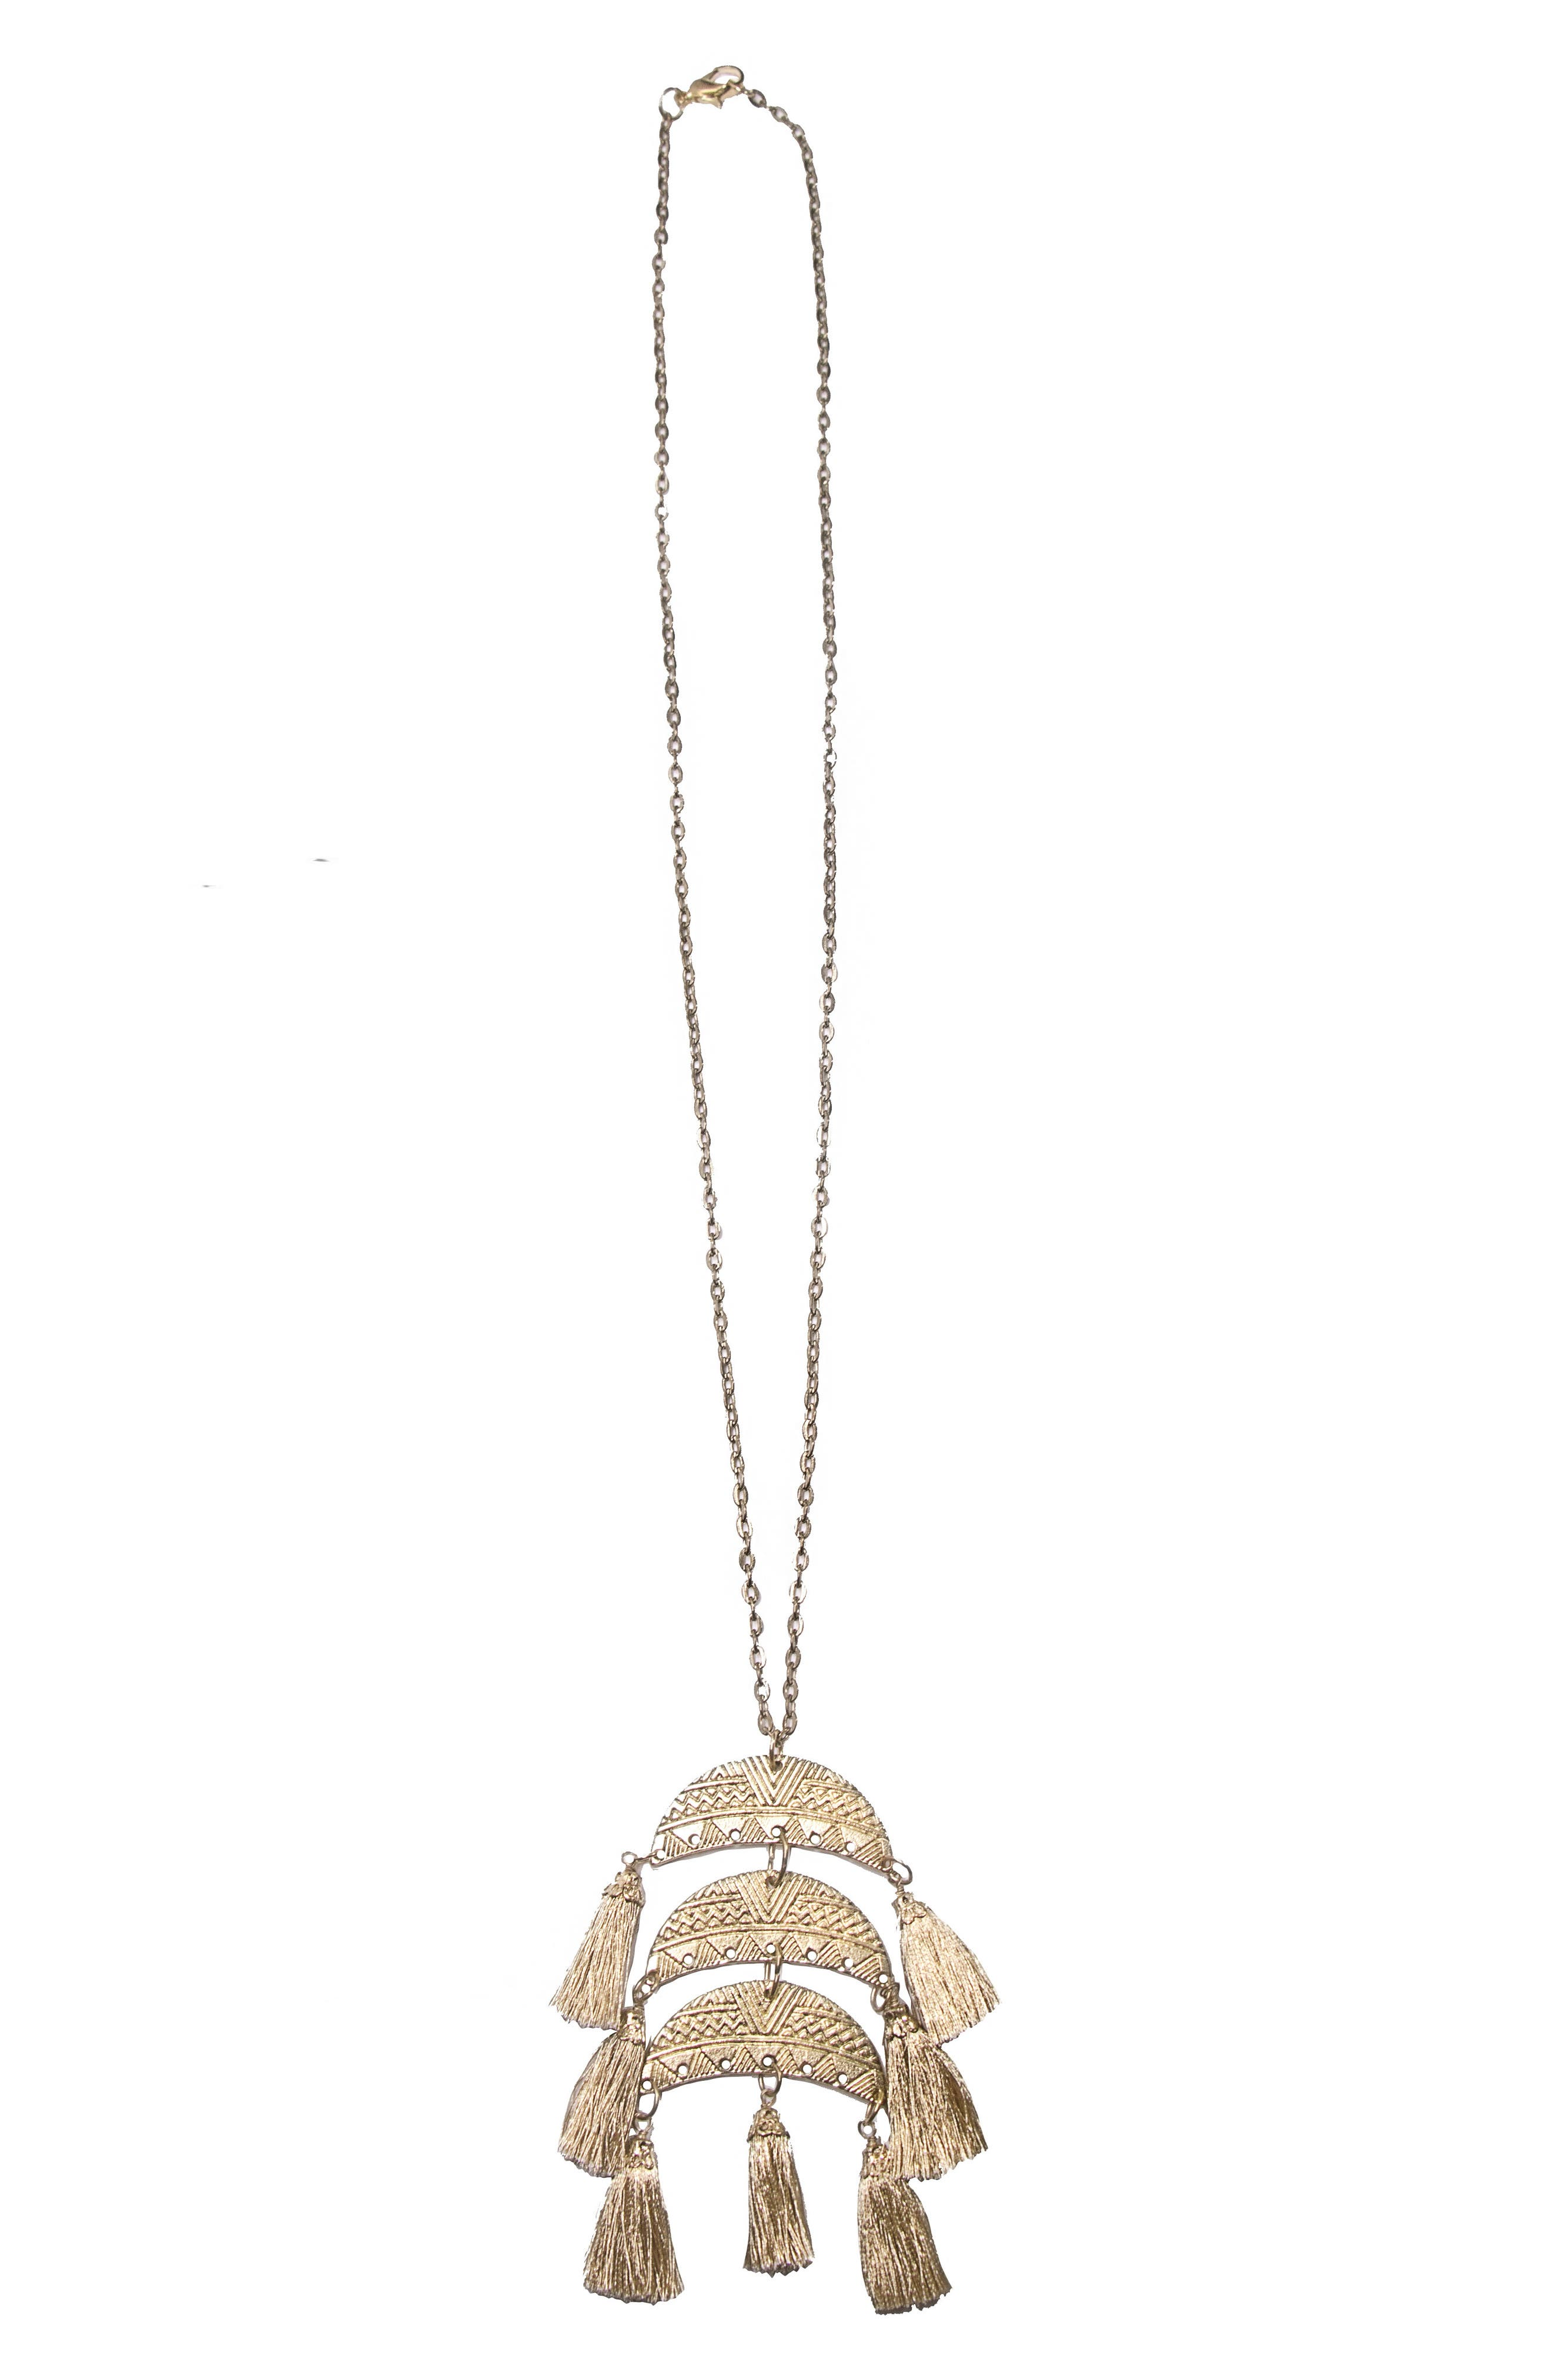 Alternate Image 1 Selected - Area Stars Goa Pendant Necklace